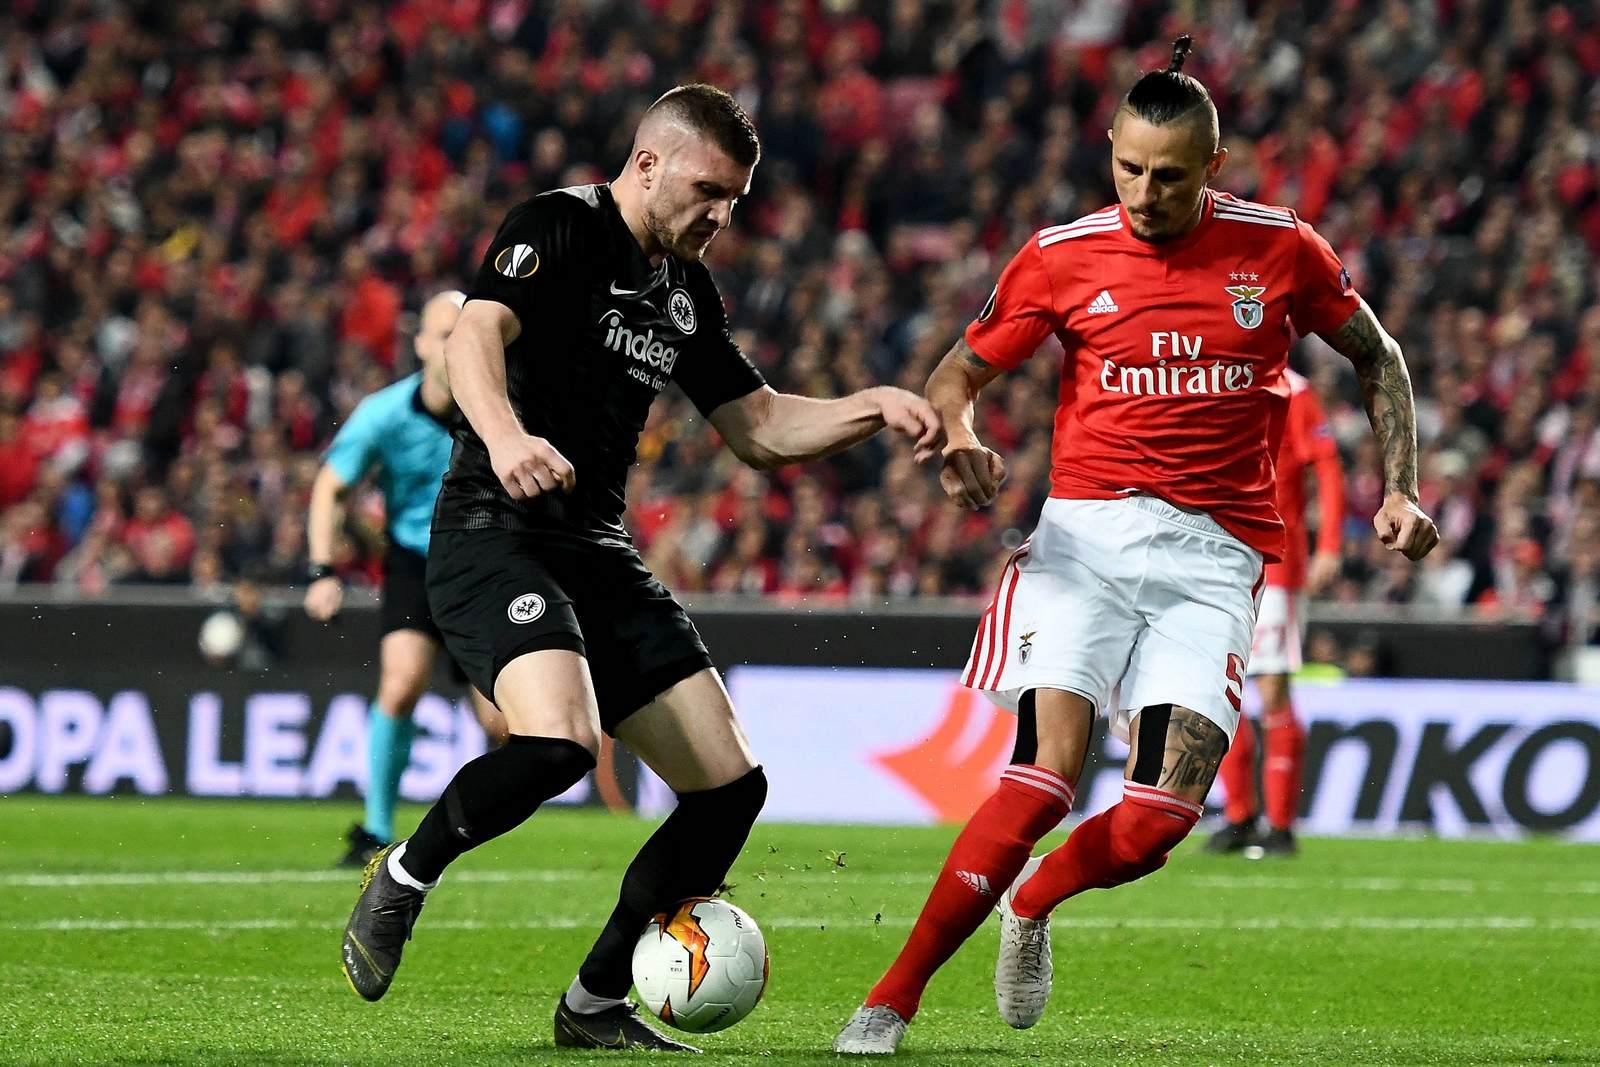 Eintracht Frankfurt vs Benfica Betting Tips